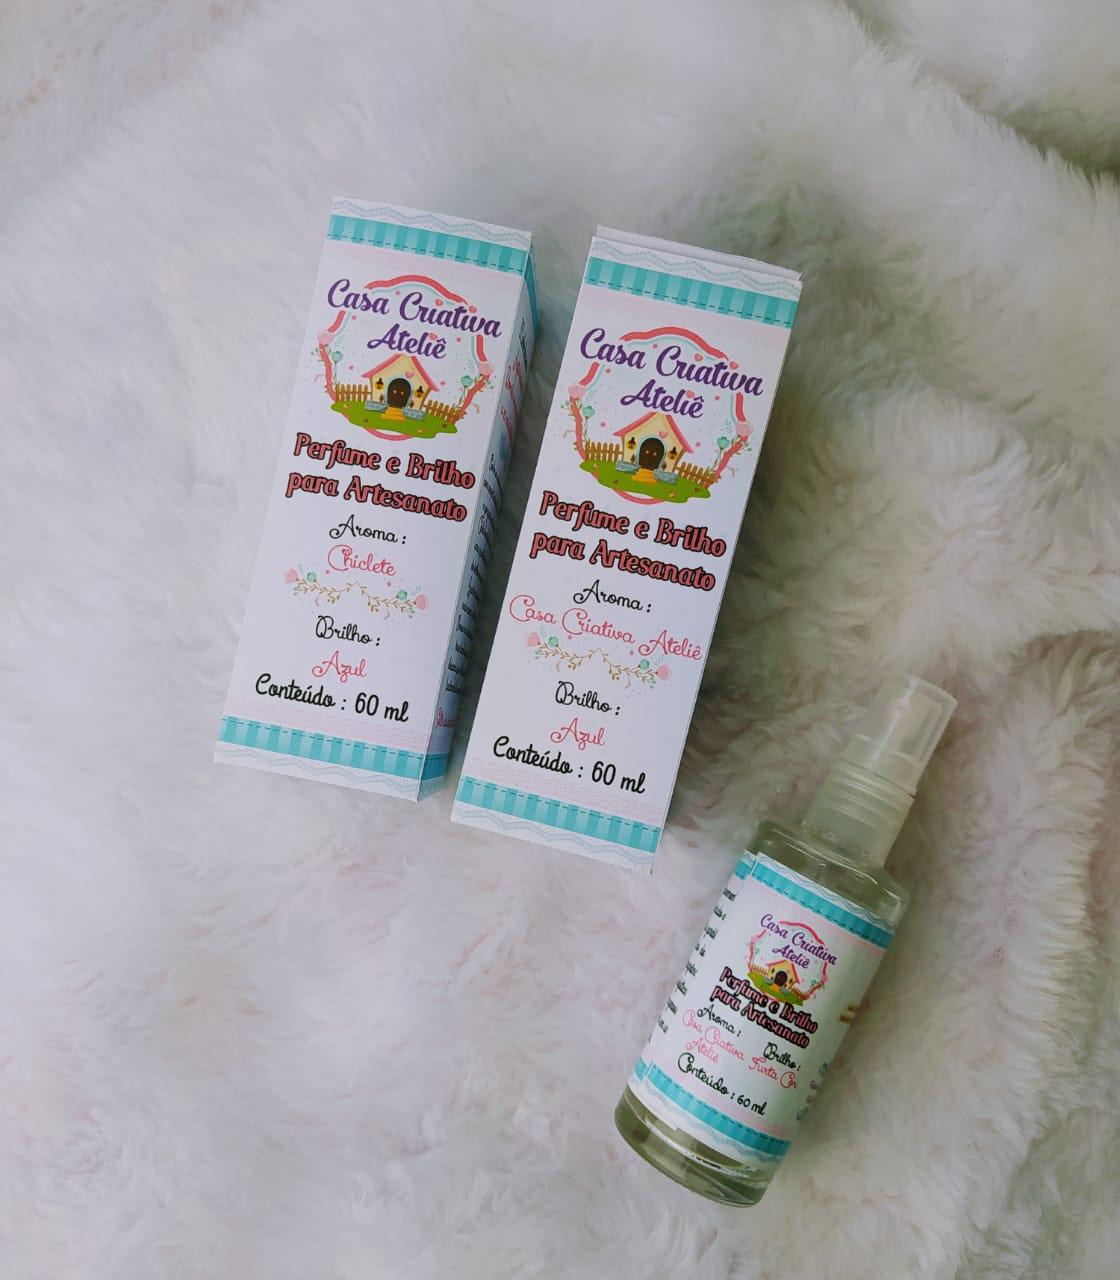 Perfume e Brilho para Artesanato - 60ml